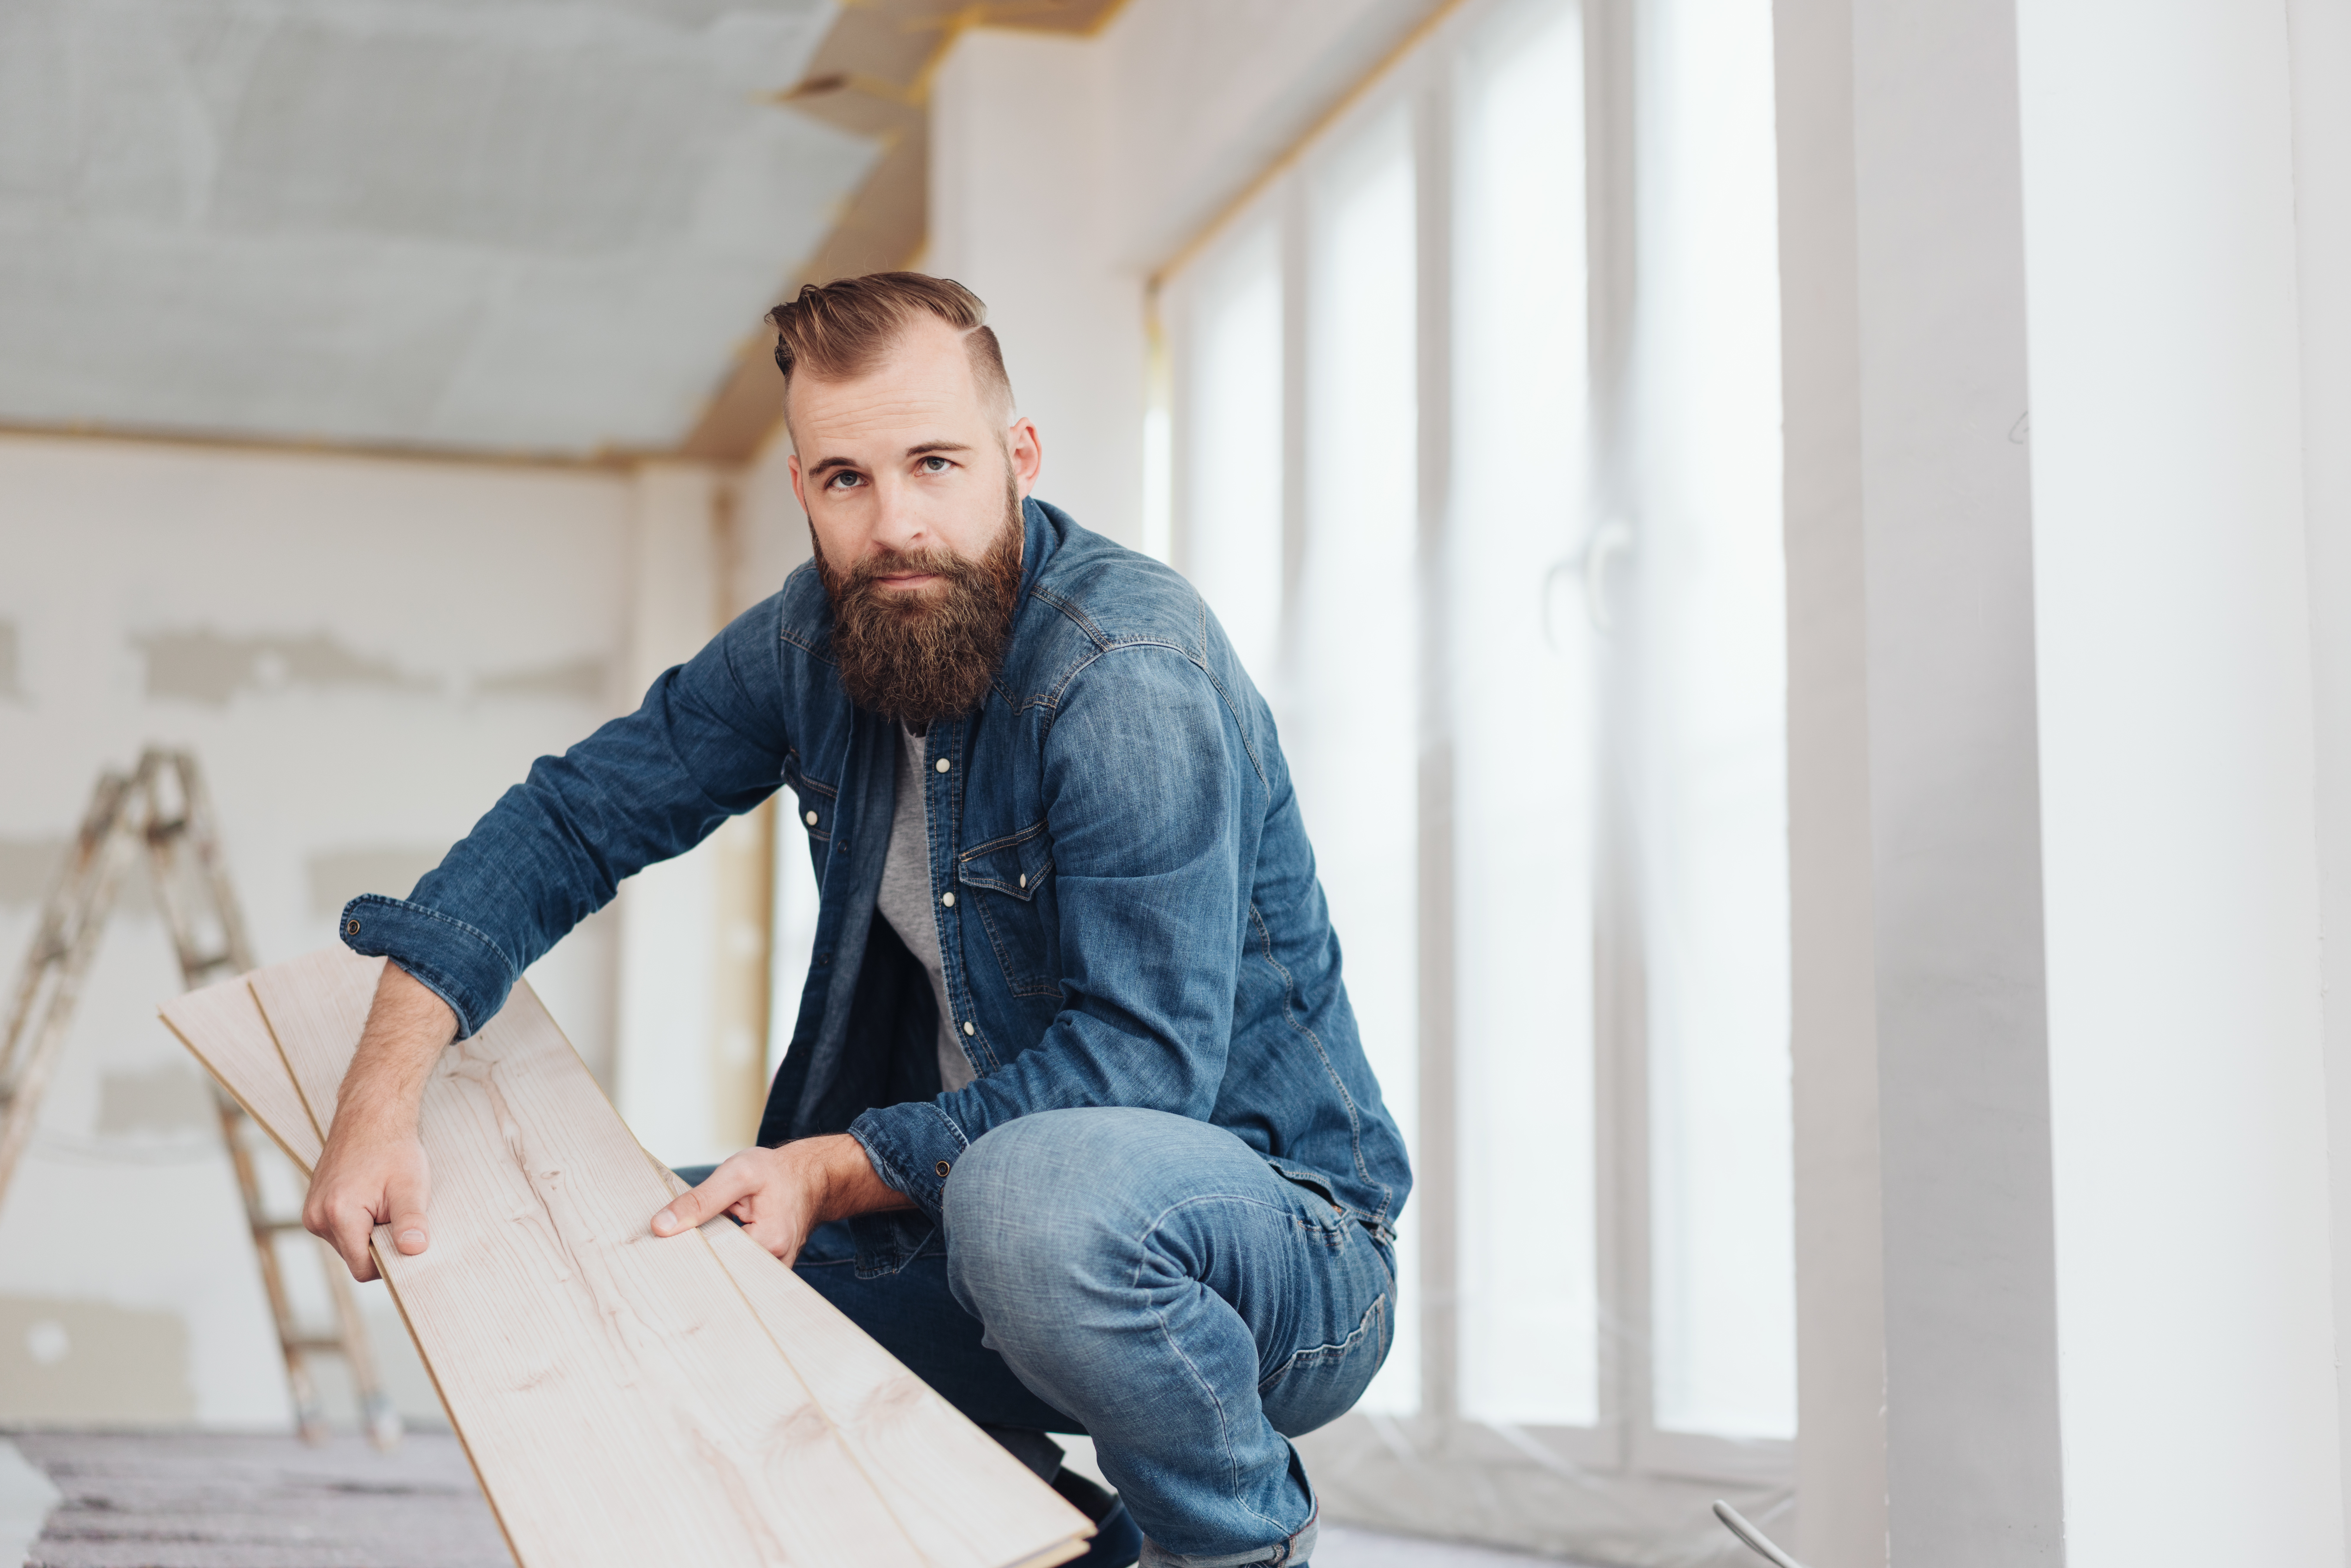 Serious bearded young man doing DIY renovations